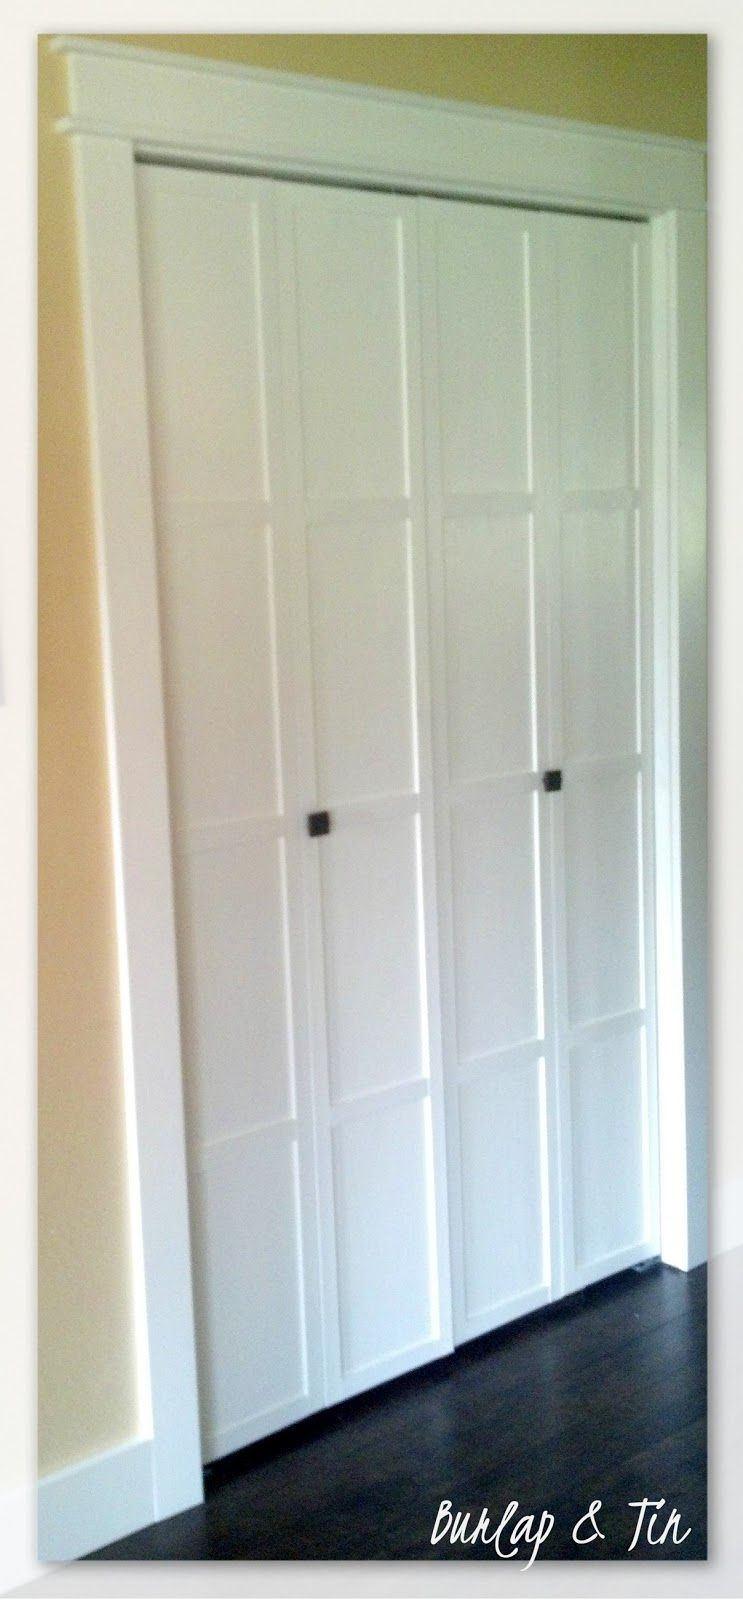 Burlap Tin Updating Boring Oak Bi Fold Doors Bifold Doors Closet Door Makeover Bifold Doors Makeover